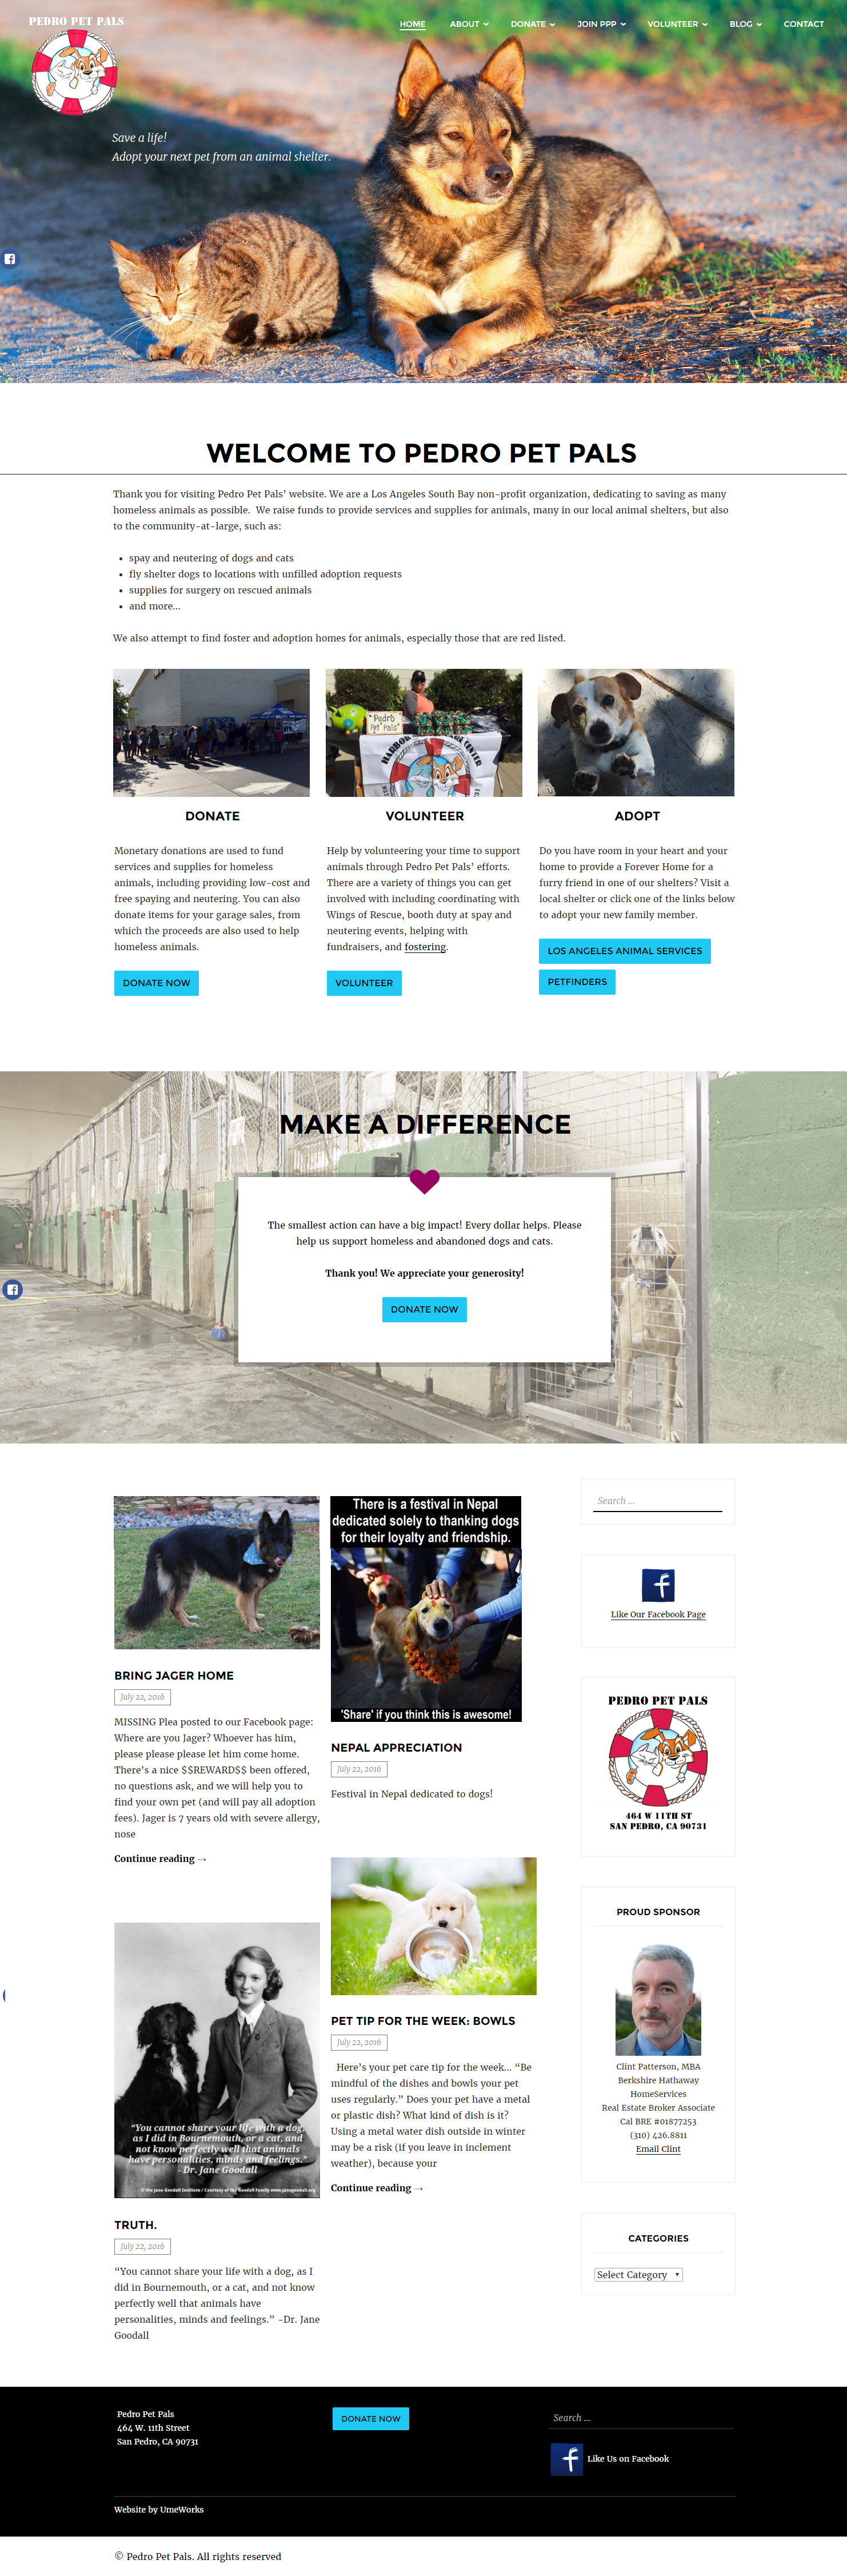 Pedro Pet Pals website design